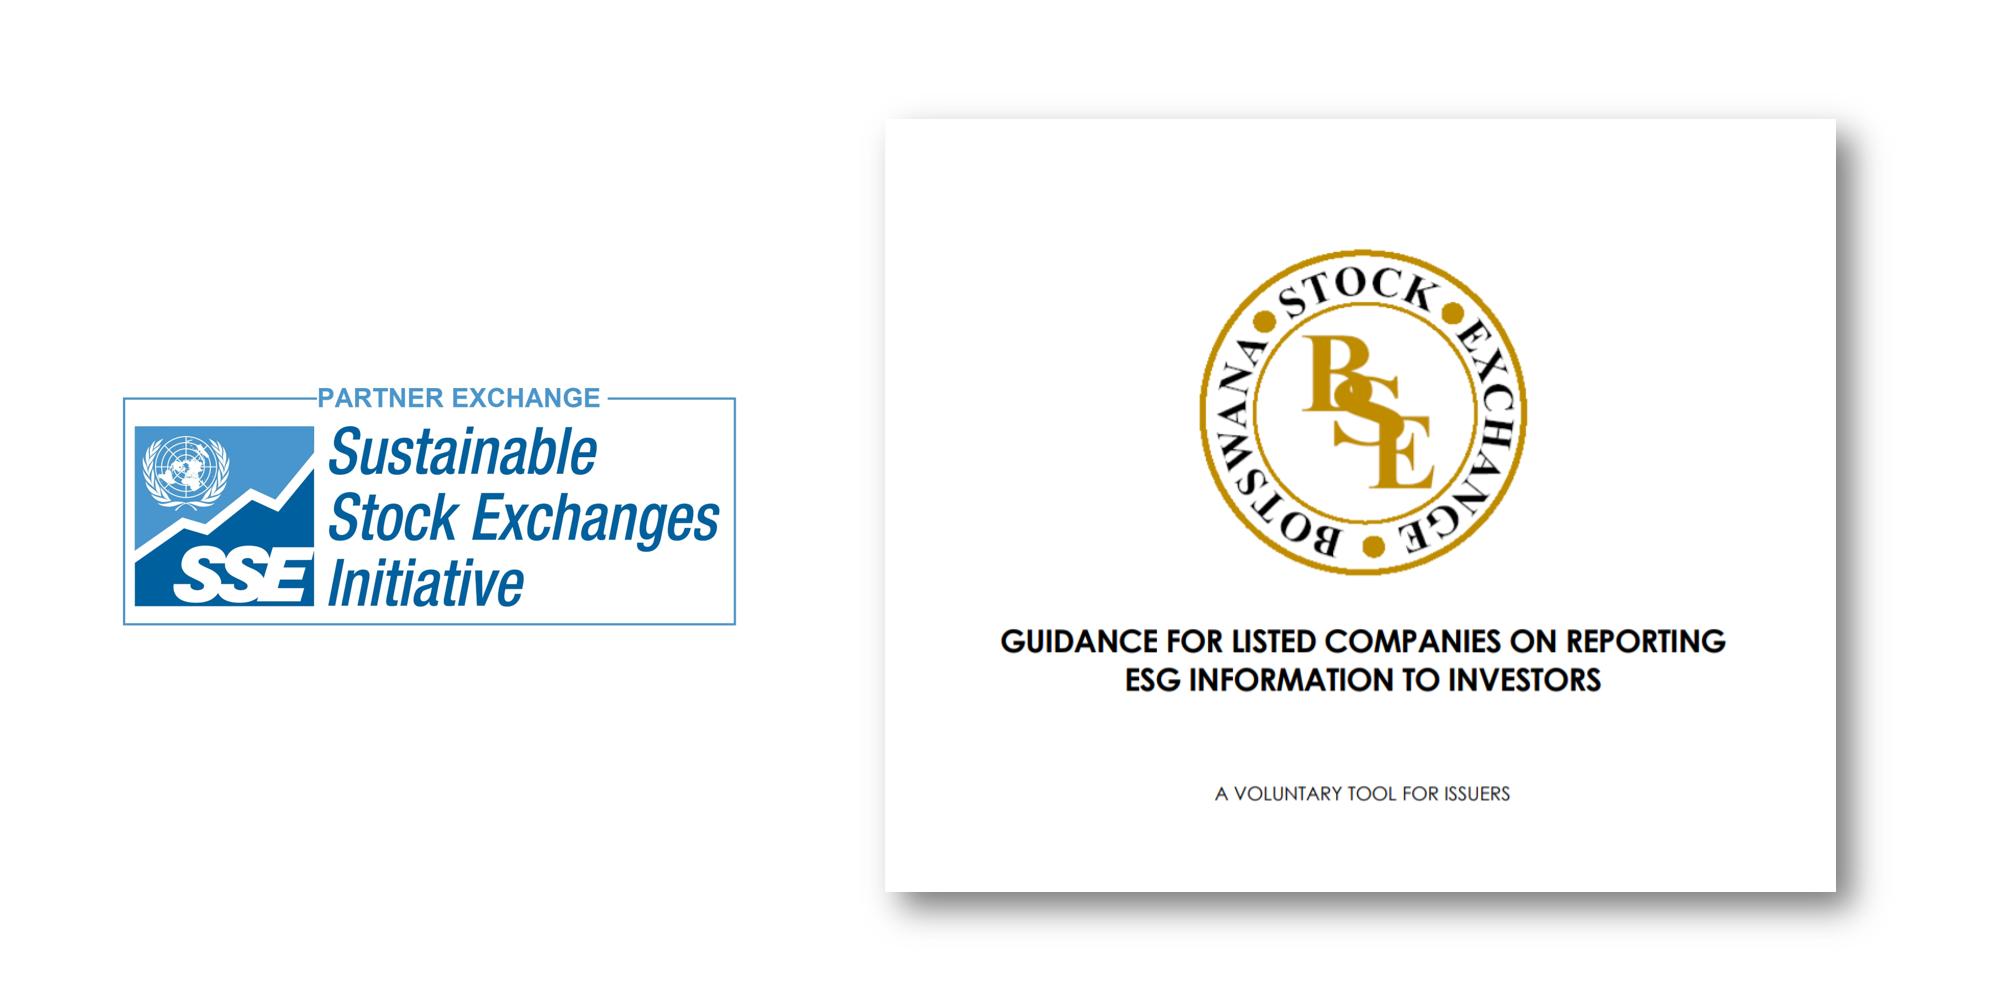 Botswana Stock Exchange fulfils commitment to publish guidance on ESG reporting